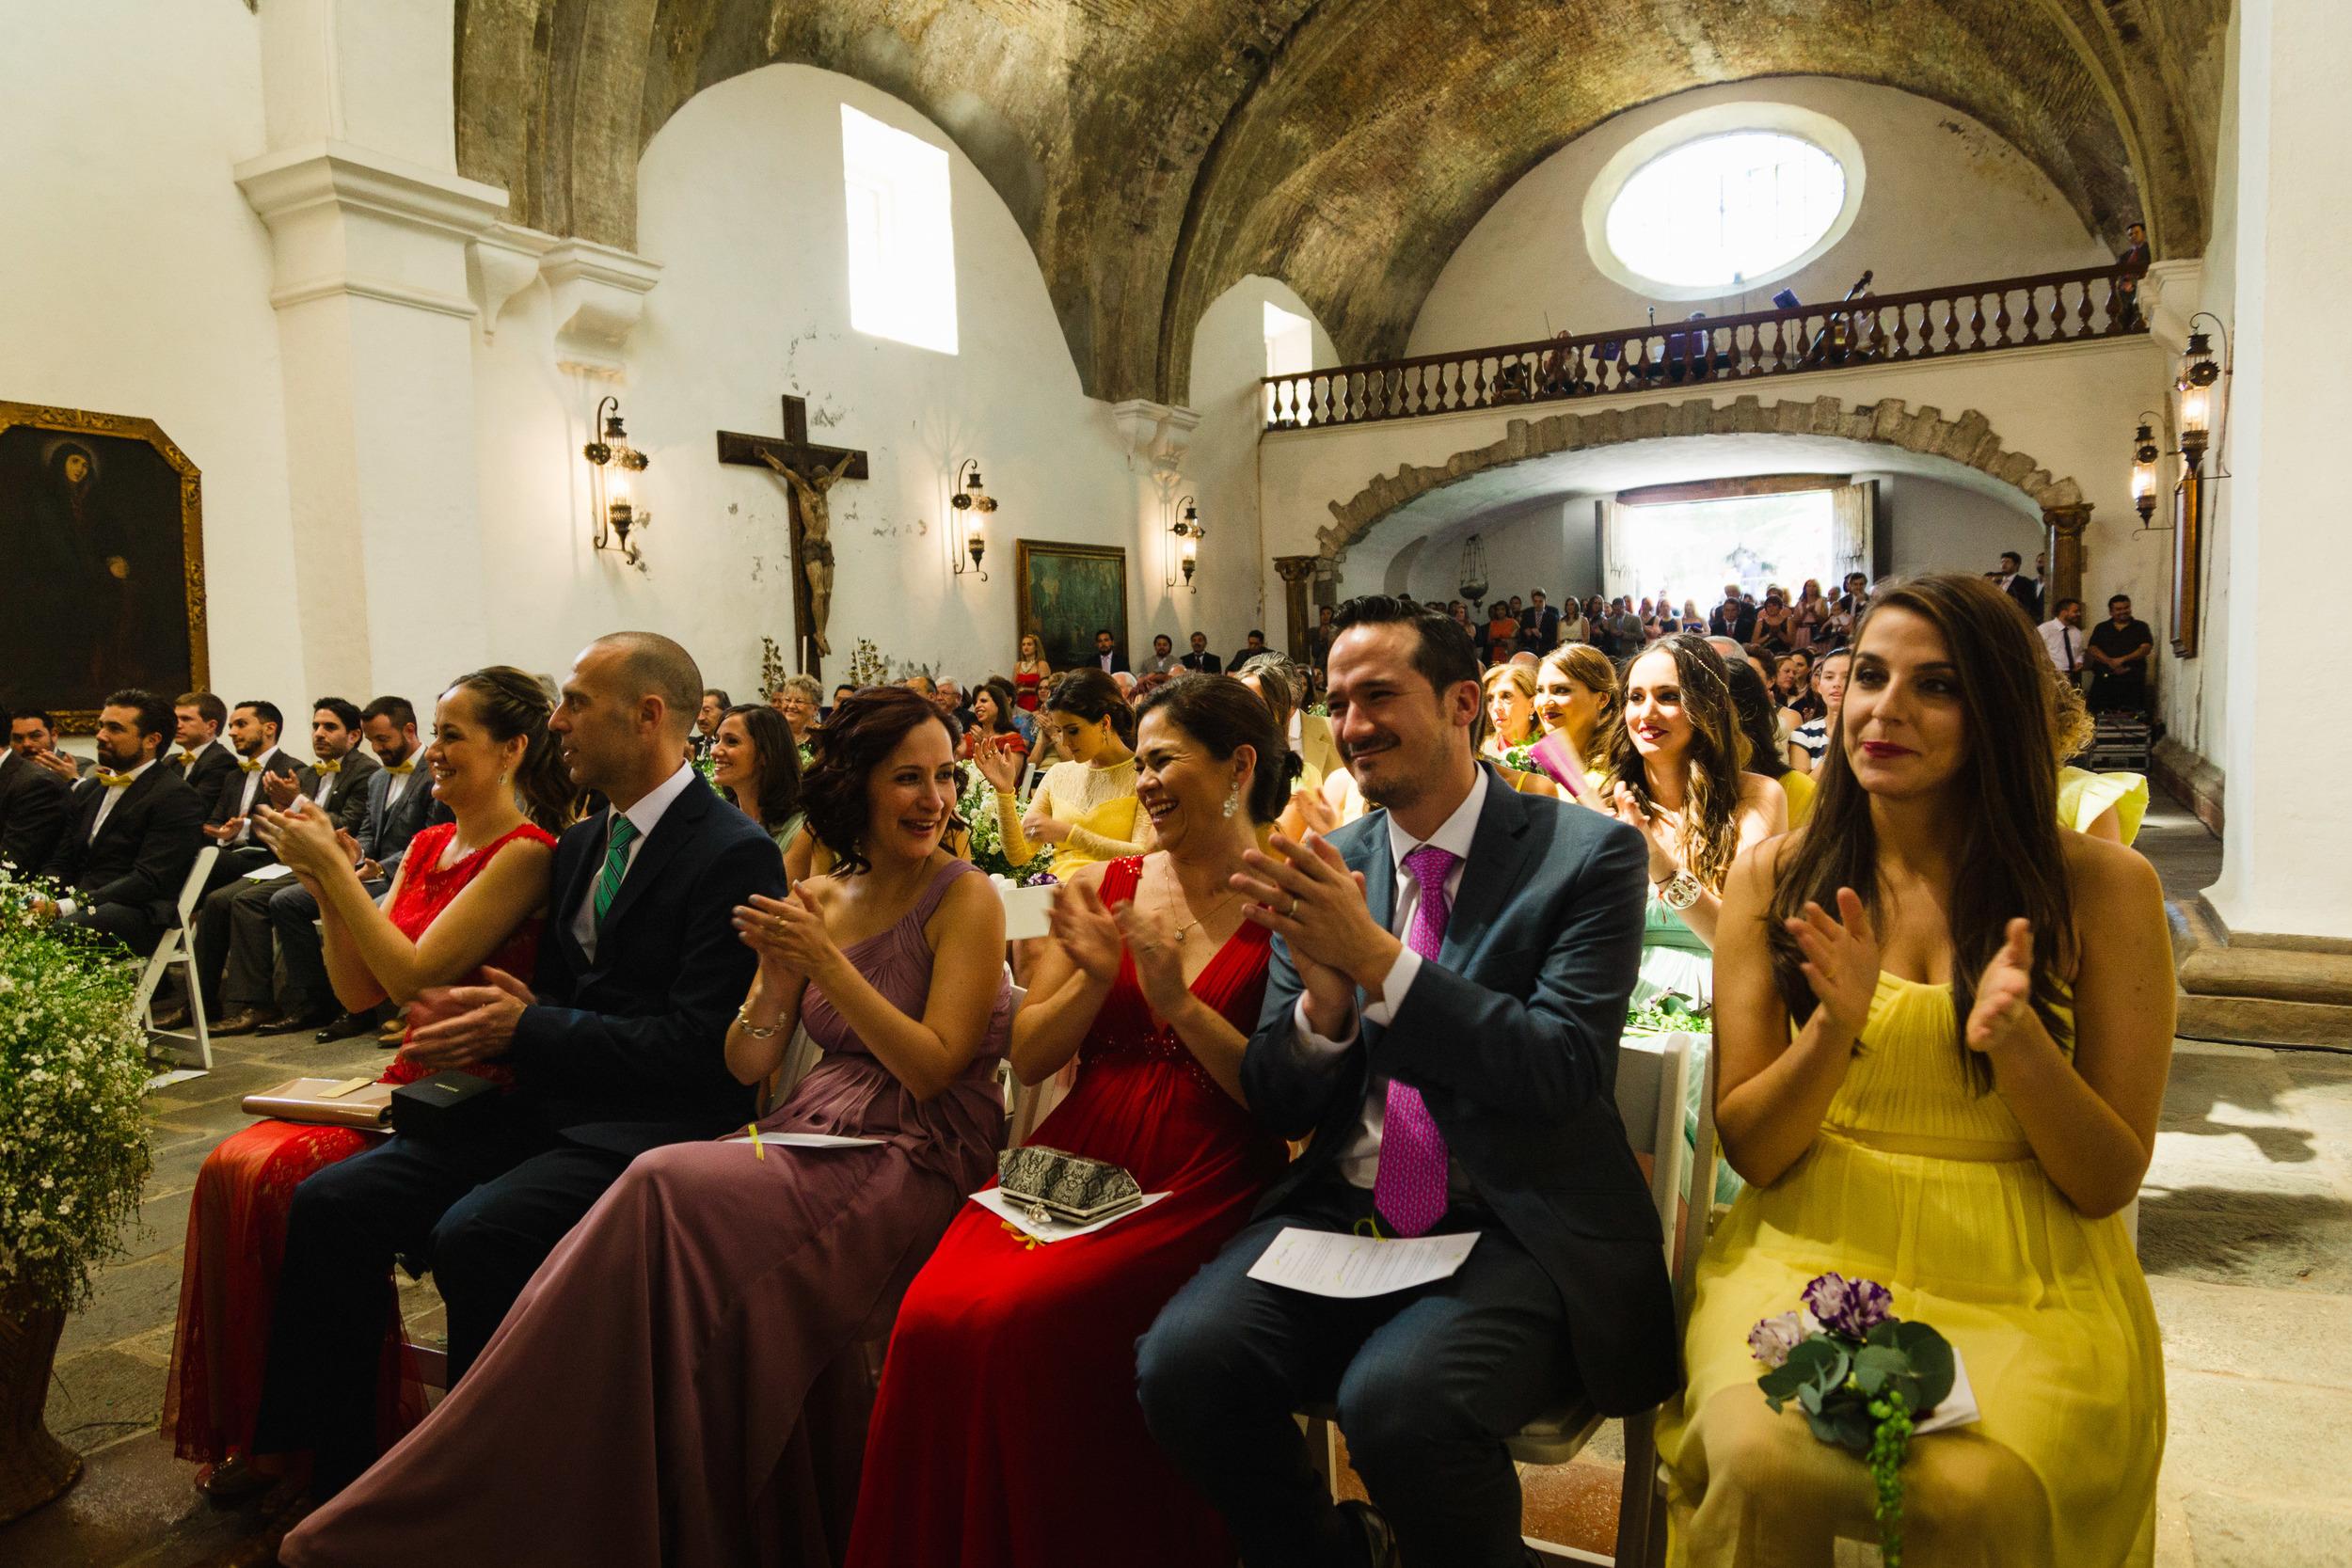 www.mauriziosolisbroca.com-acamilpa-renata-paul-20160312DSC03391-Edit.jpg